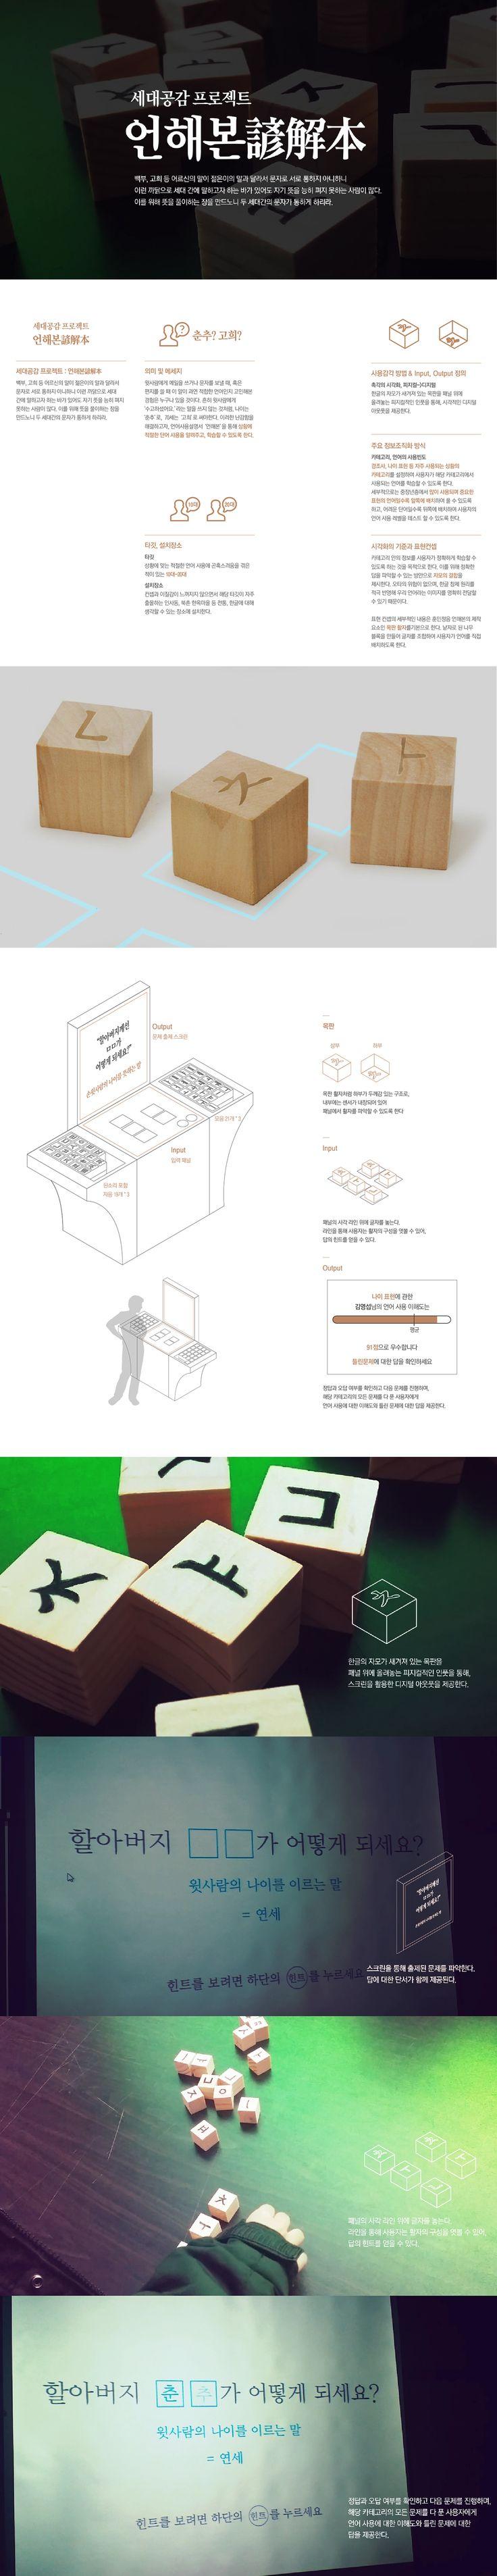 Hong Yeongin│ Information Visualization 2015│ Major in Digital Media Design │#hicoda │hicoda.hongik.ac.kr